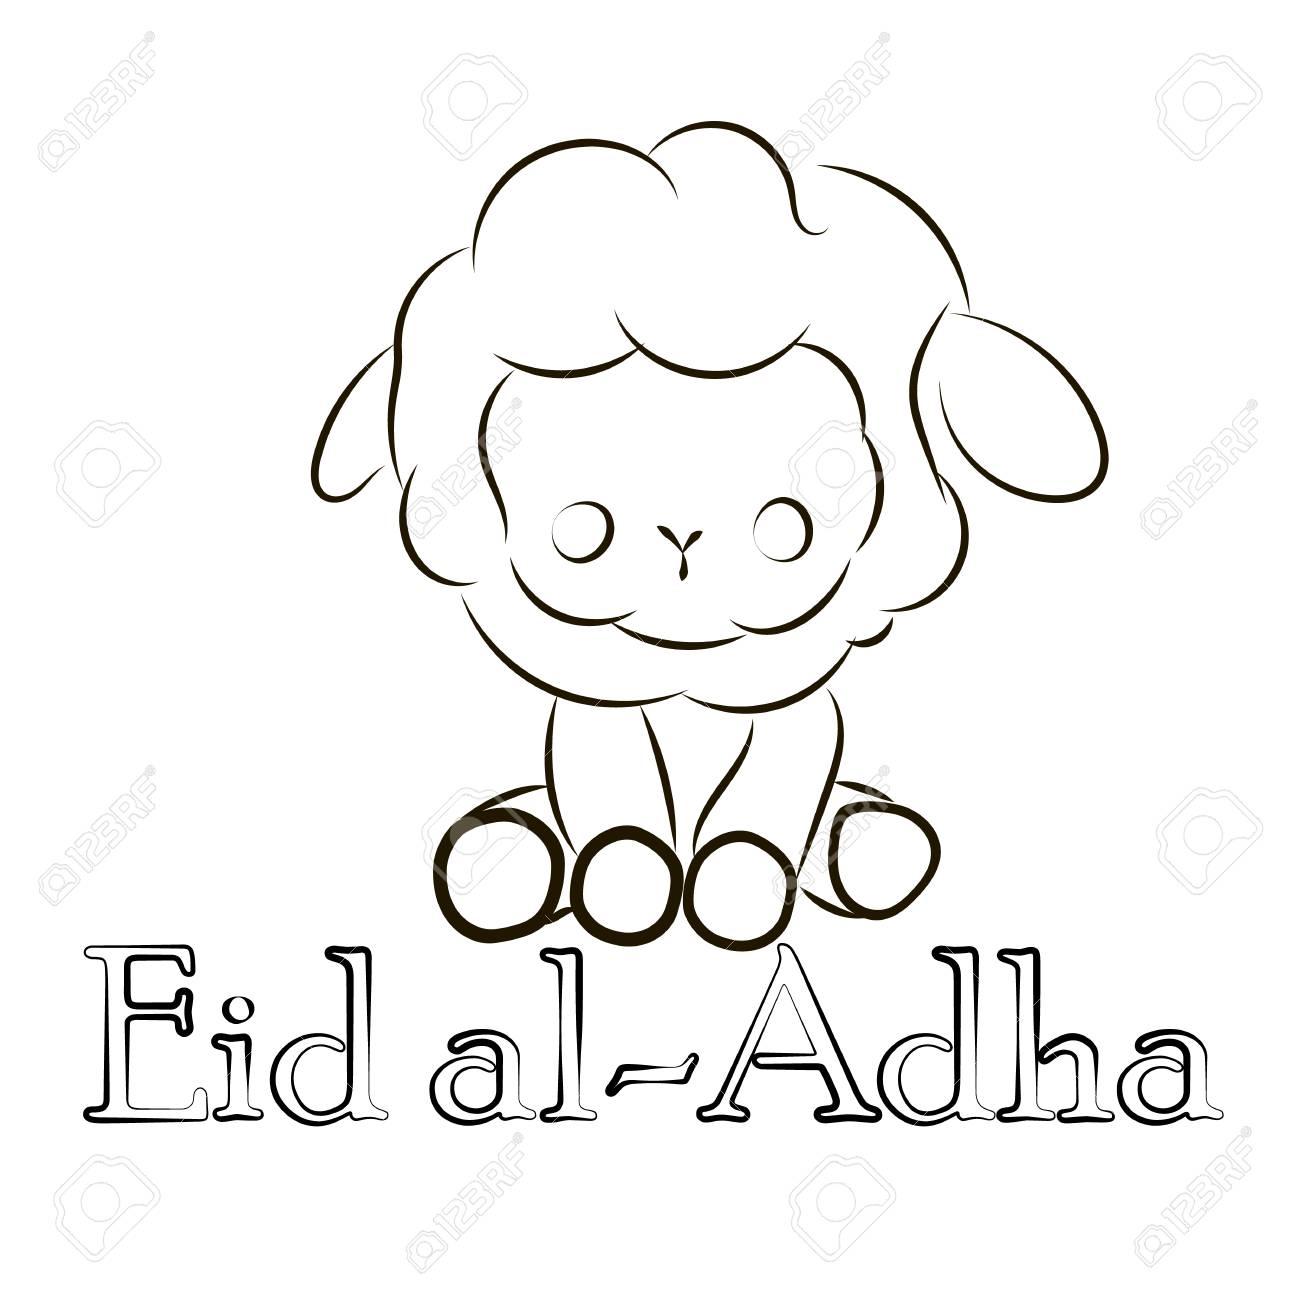 Muslim holiday Eid al-Adha, kurban bairam, image of a lamb isolated on a white background - 103984243